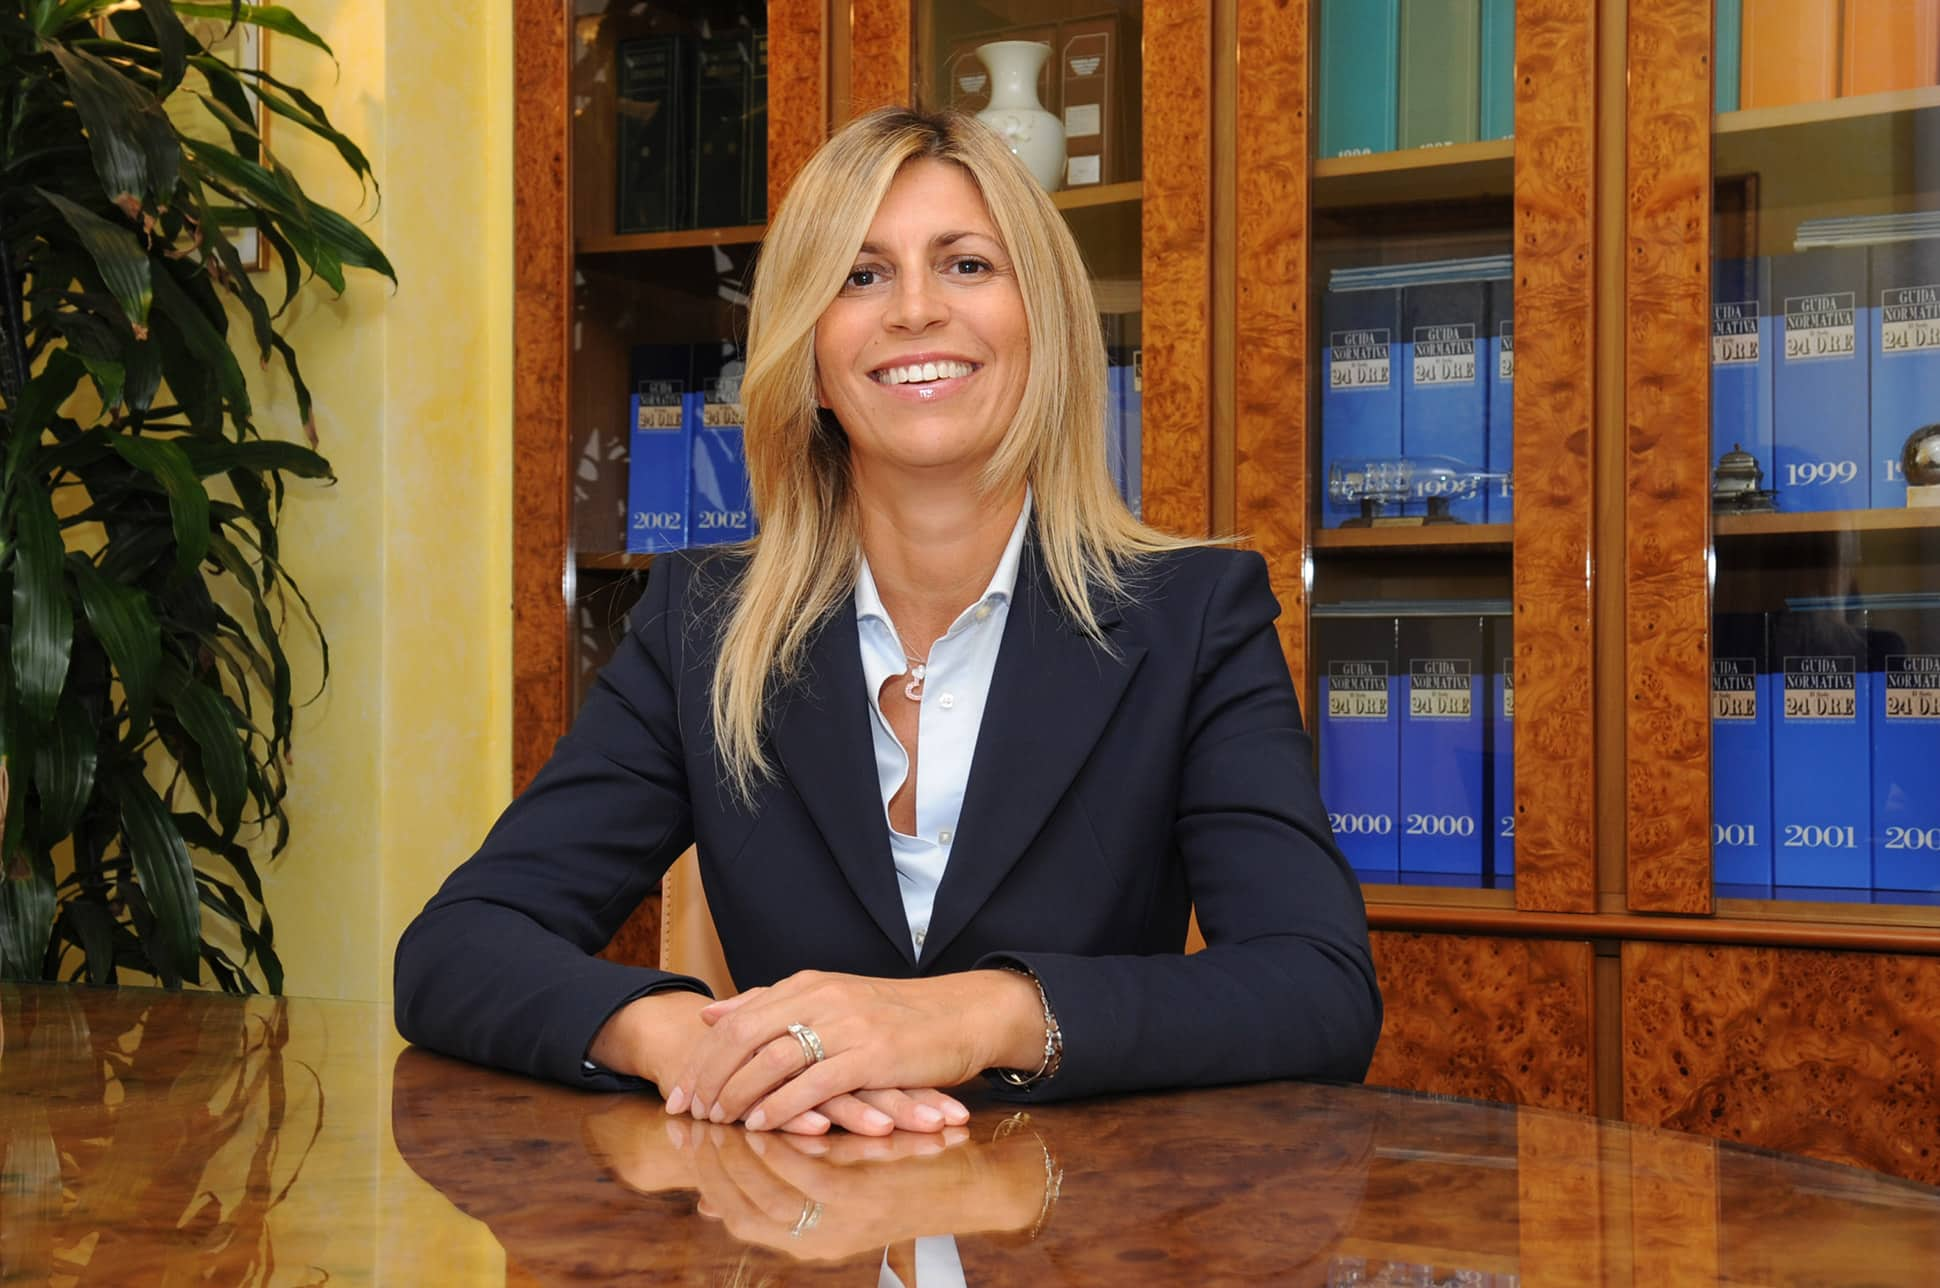 Raffaella Pagani